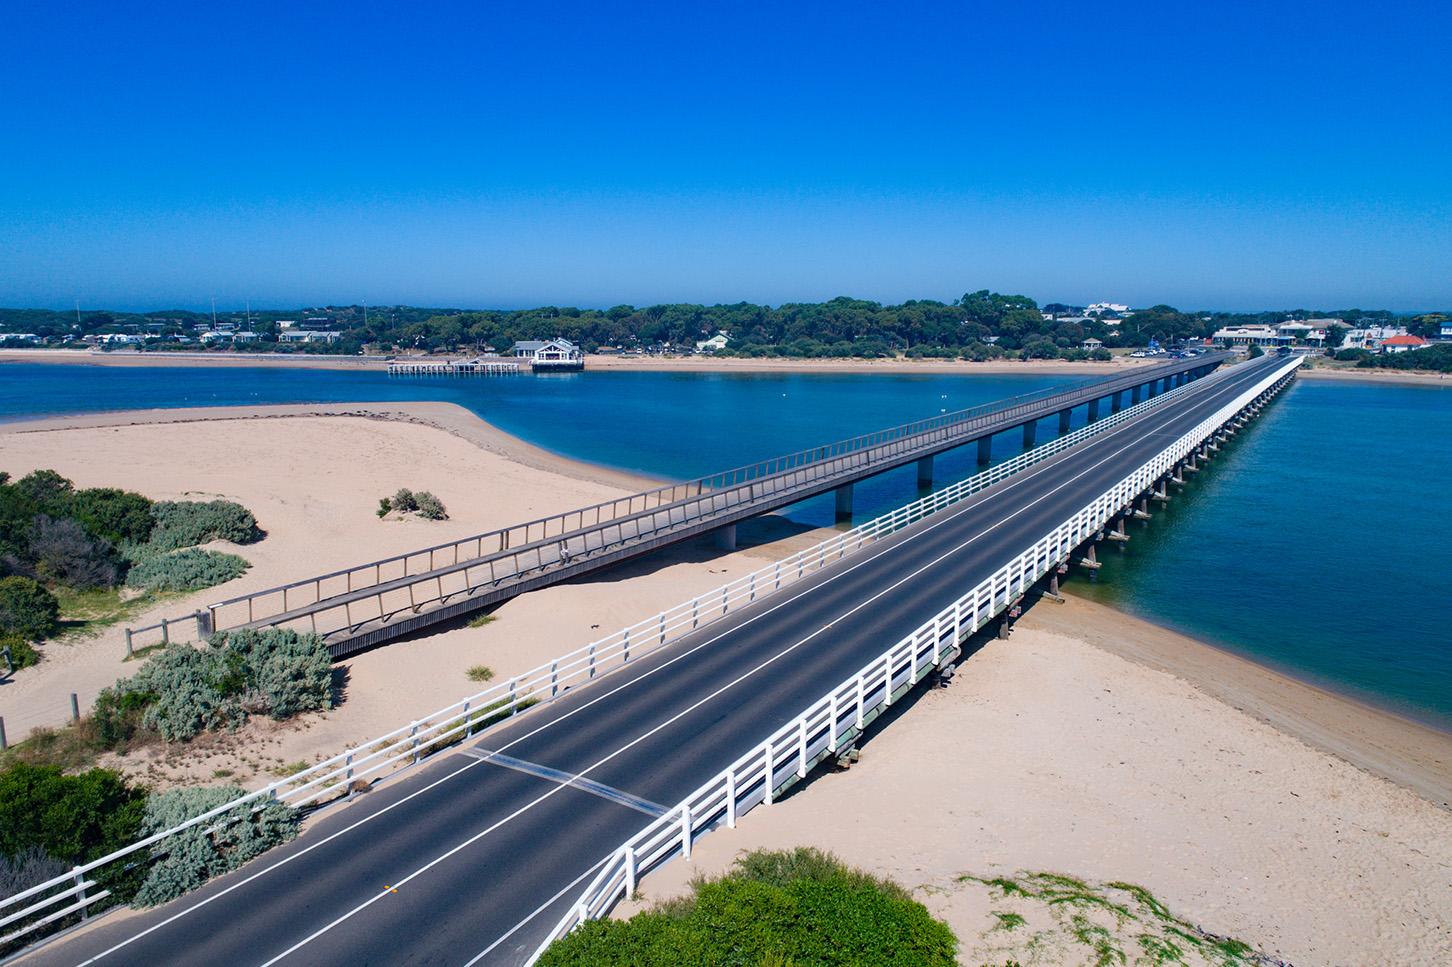 BH Summer Bridge 2